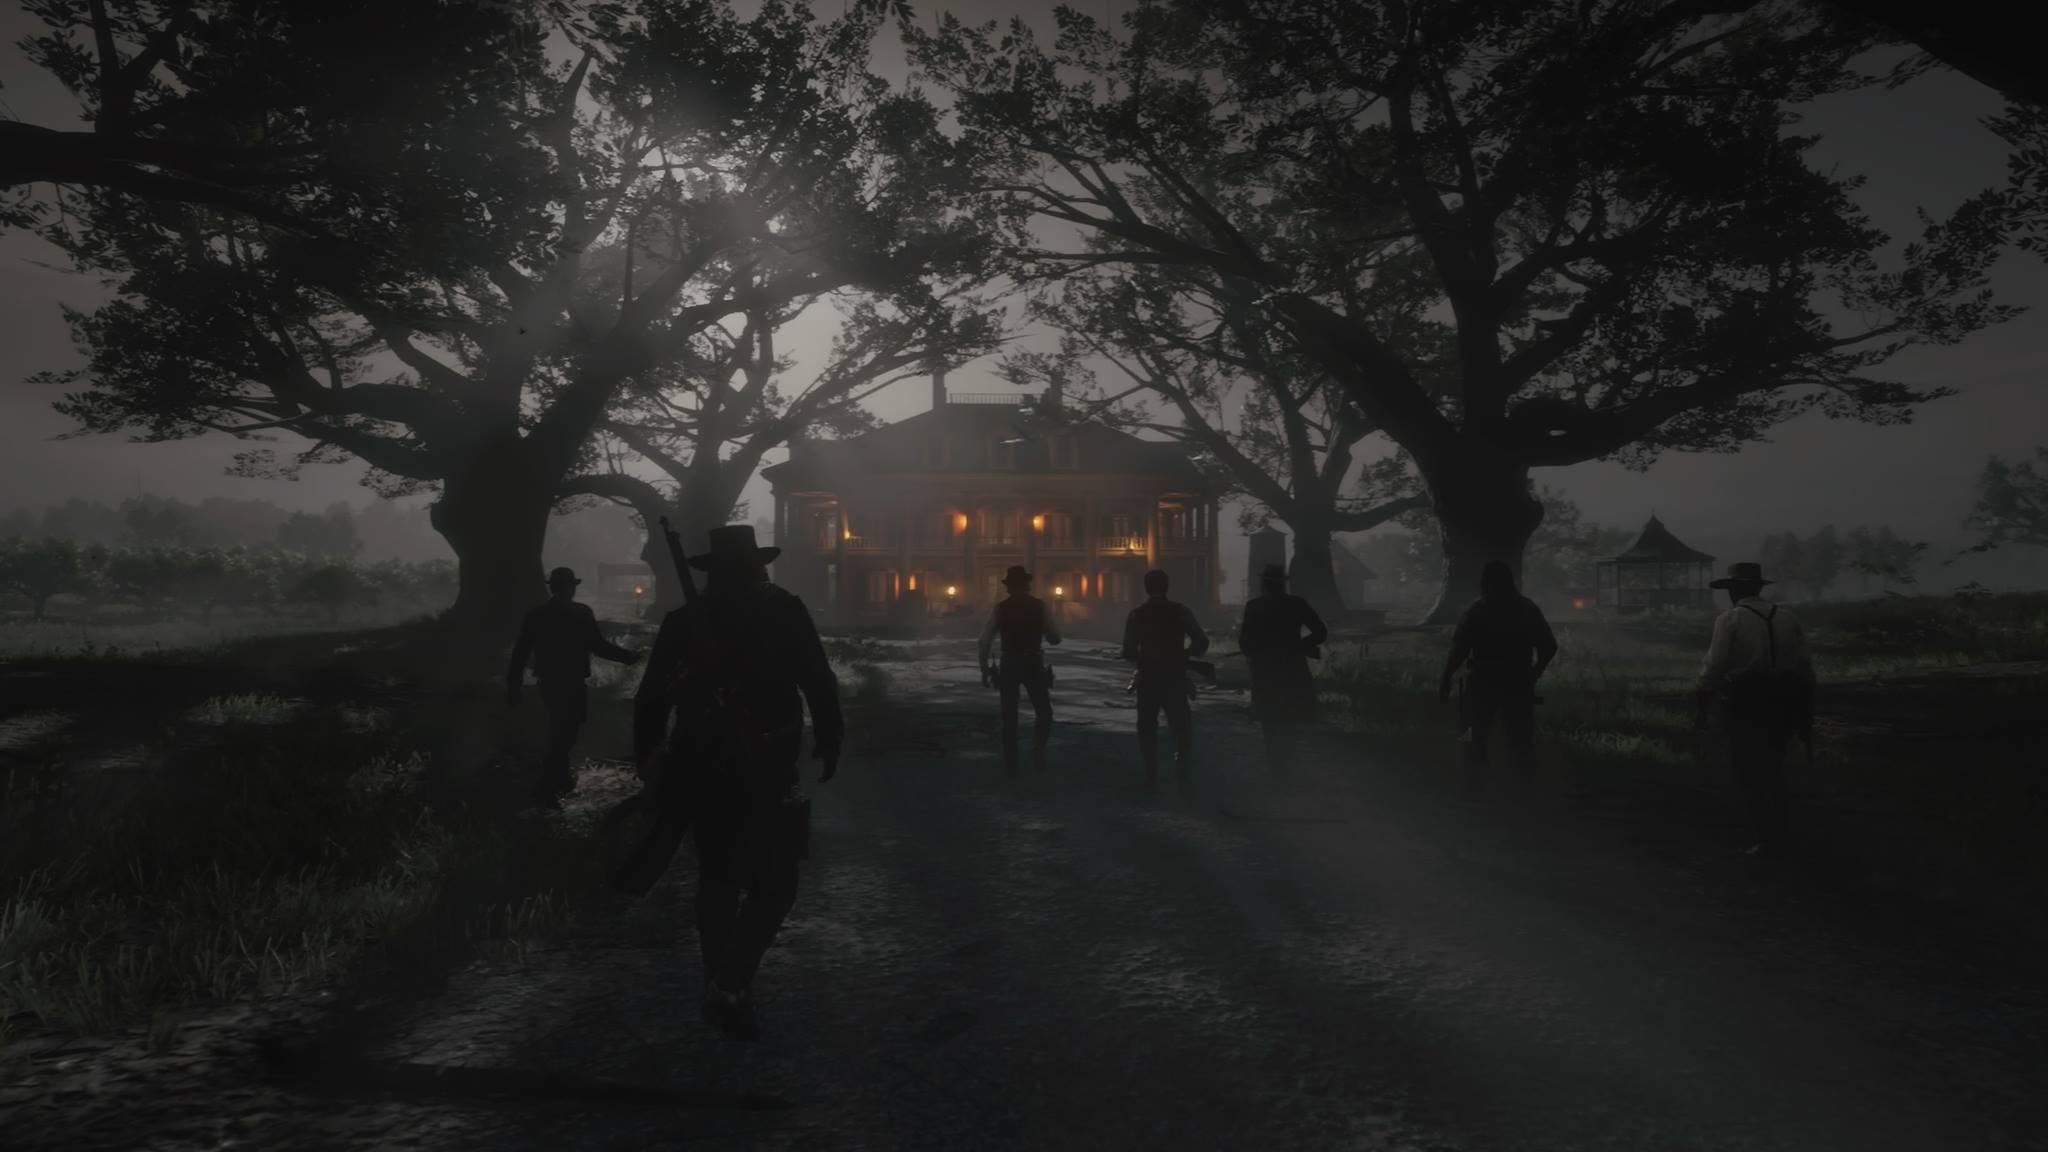 Wallpaper : Red Dead Redemption 2, Rockstar Games, RDR2